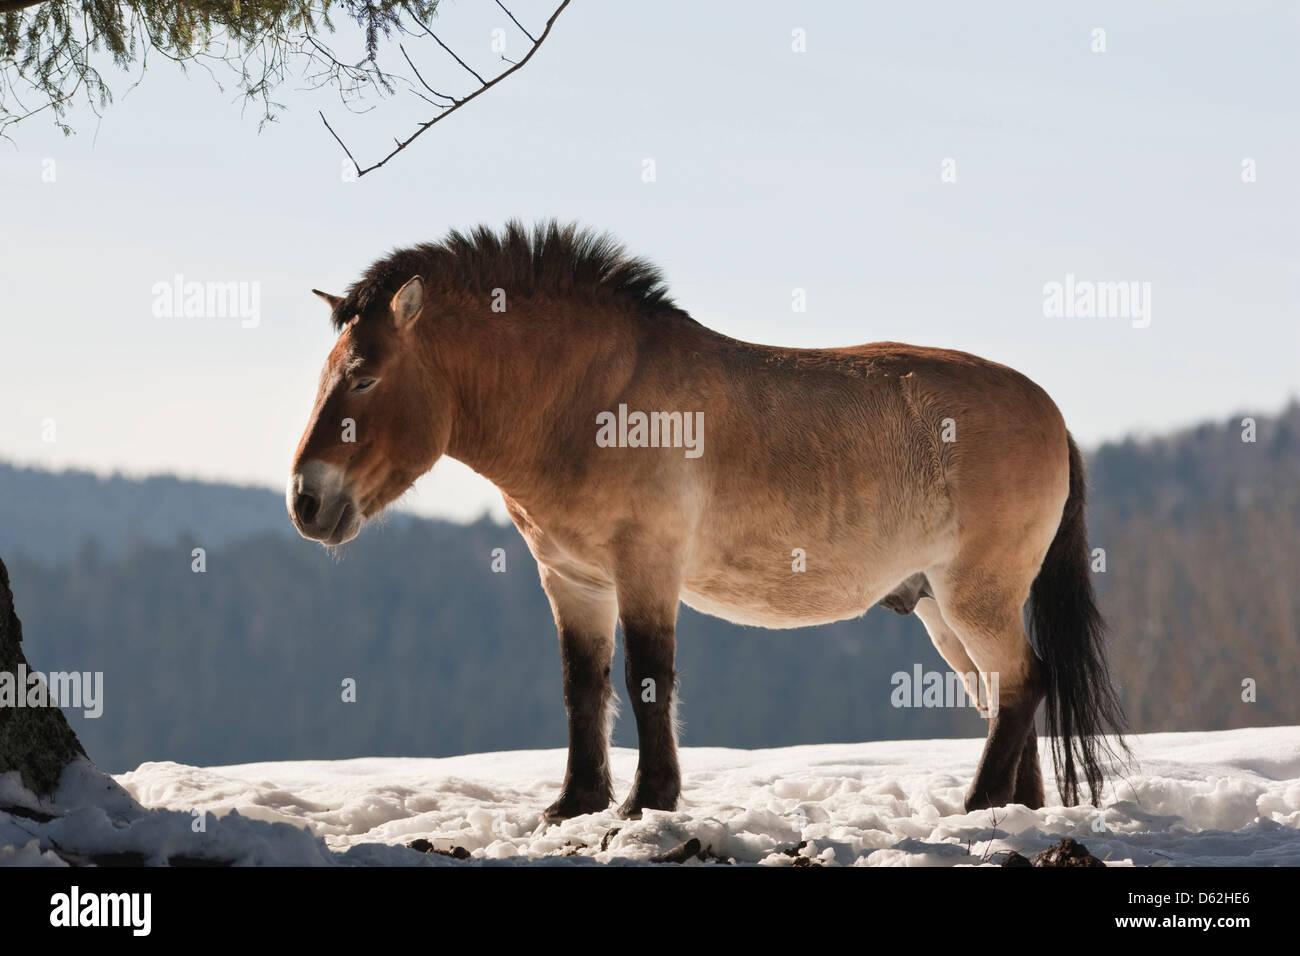 Germany, Bavaria, National Park Bayerischer Wald. Przewalski's Horse or Takhi (Equus ferus przewalskii) in snow, Stock Photo